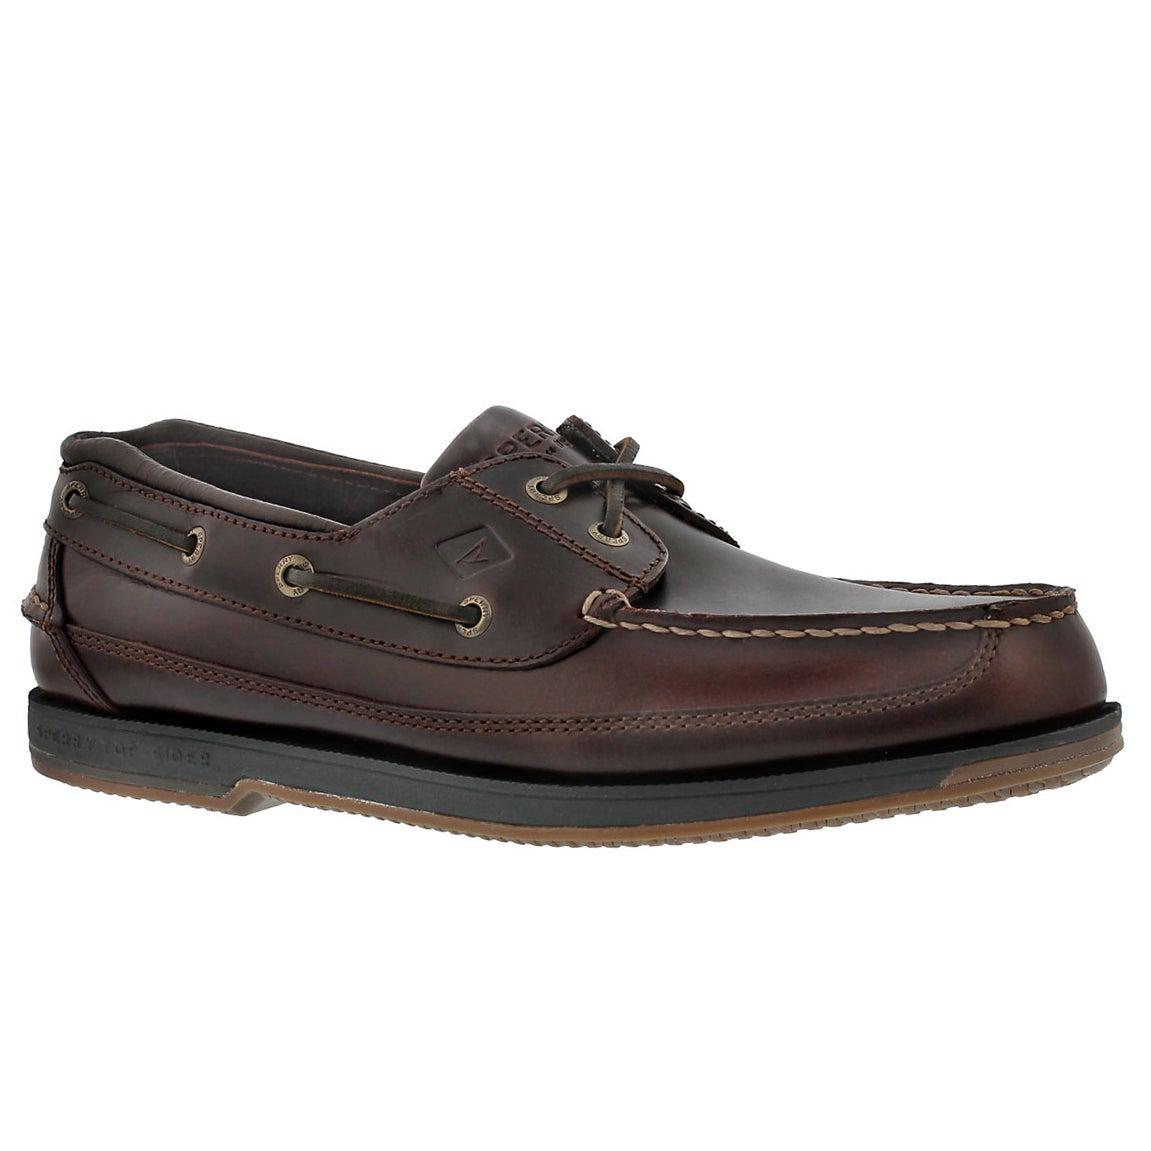 Mns Charter 2-Eye amaretto boat shoe